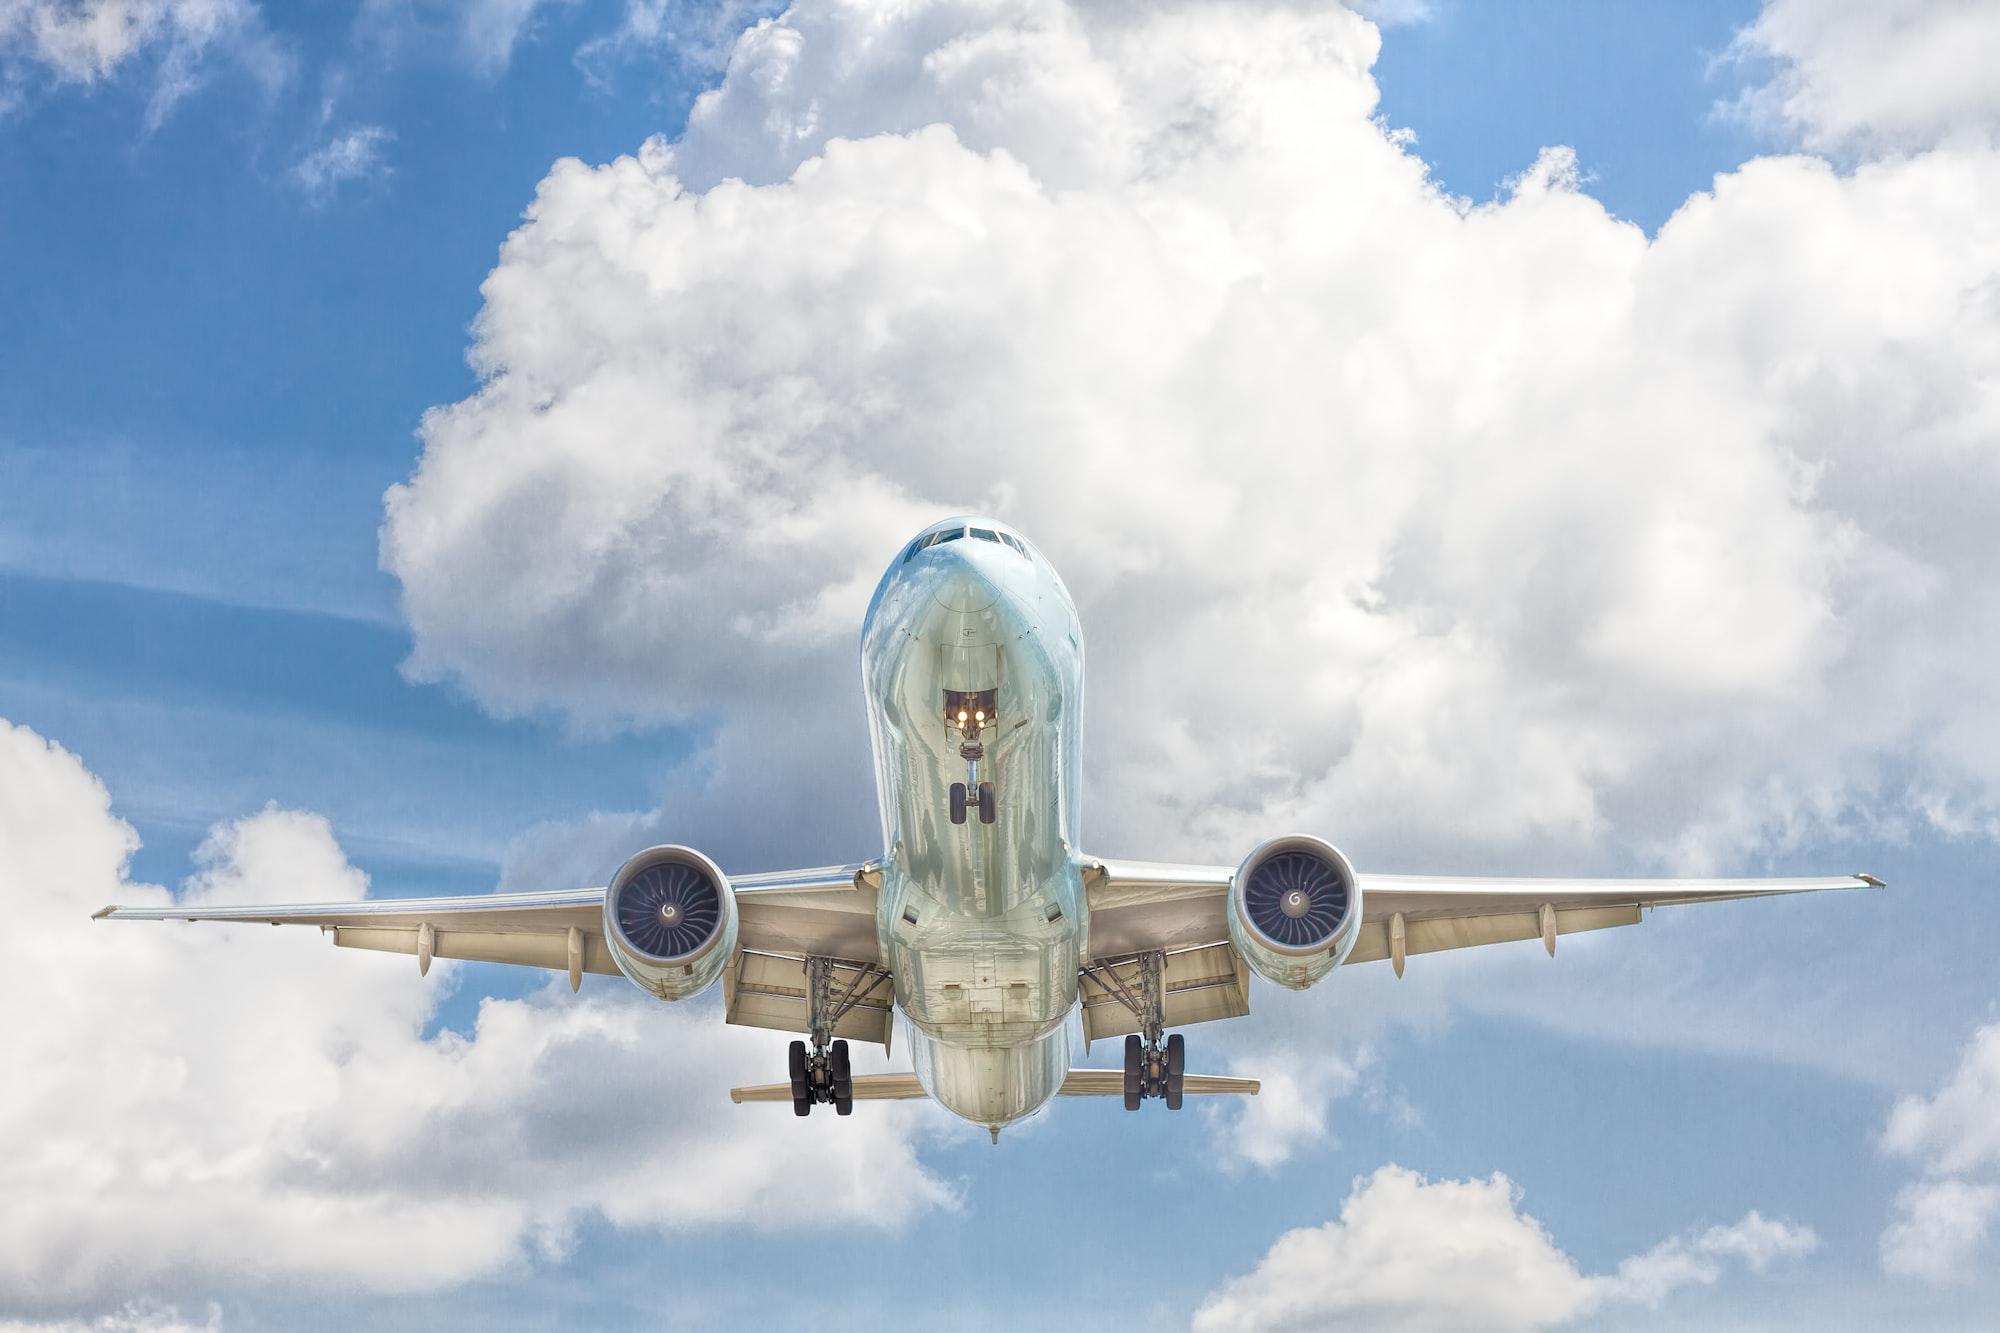 SJ Flight 182 Indonesia Jakarta-Pontianak Crash